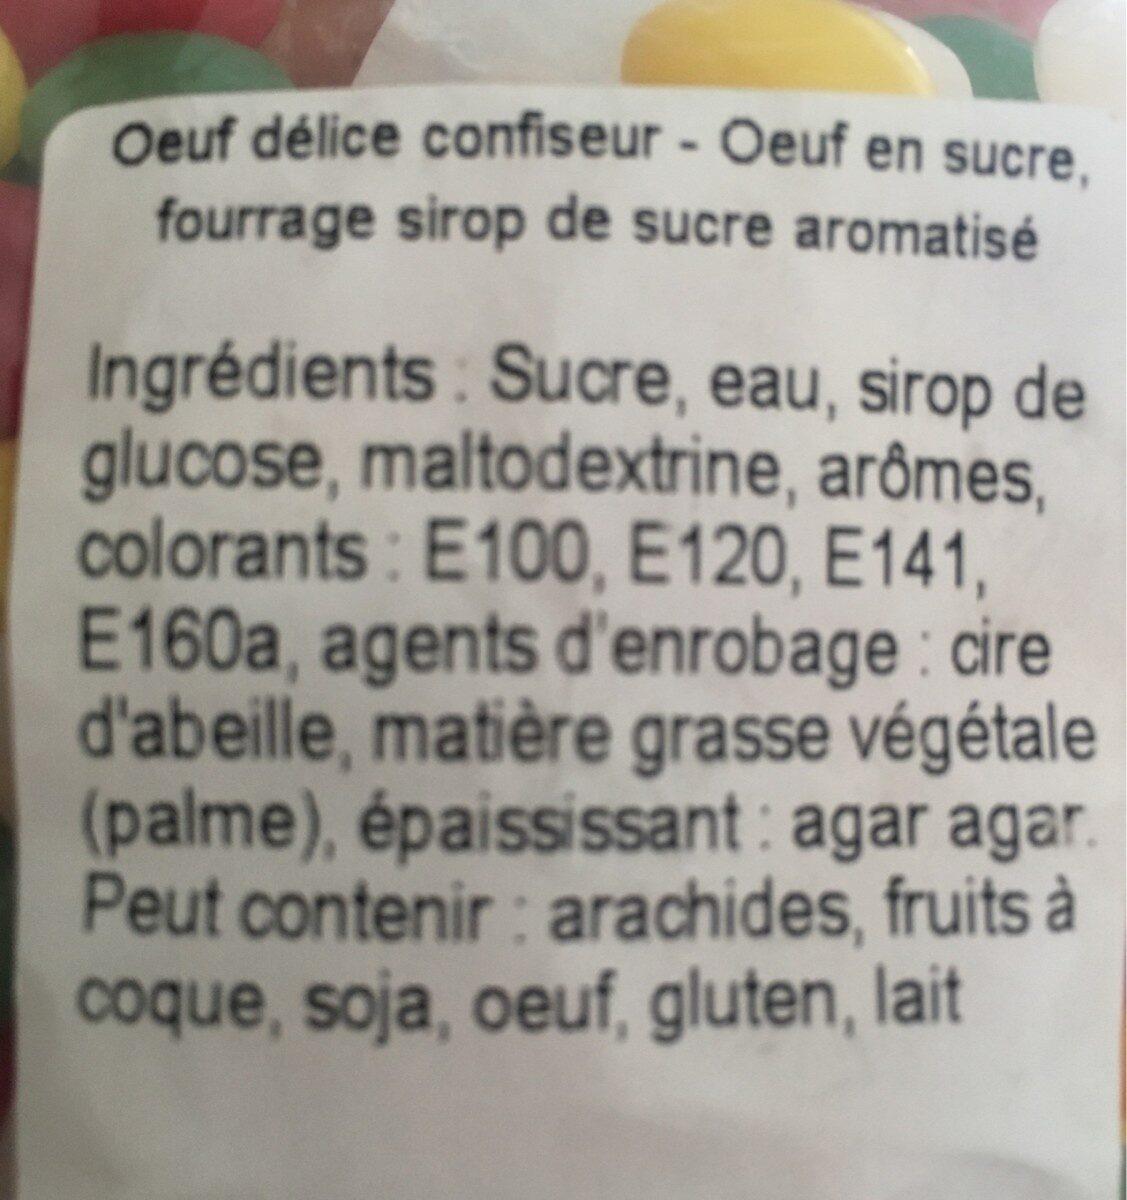 Oeufs delice confiseur - Ingredients